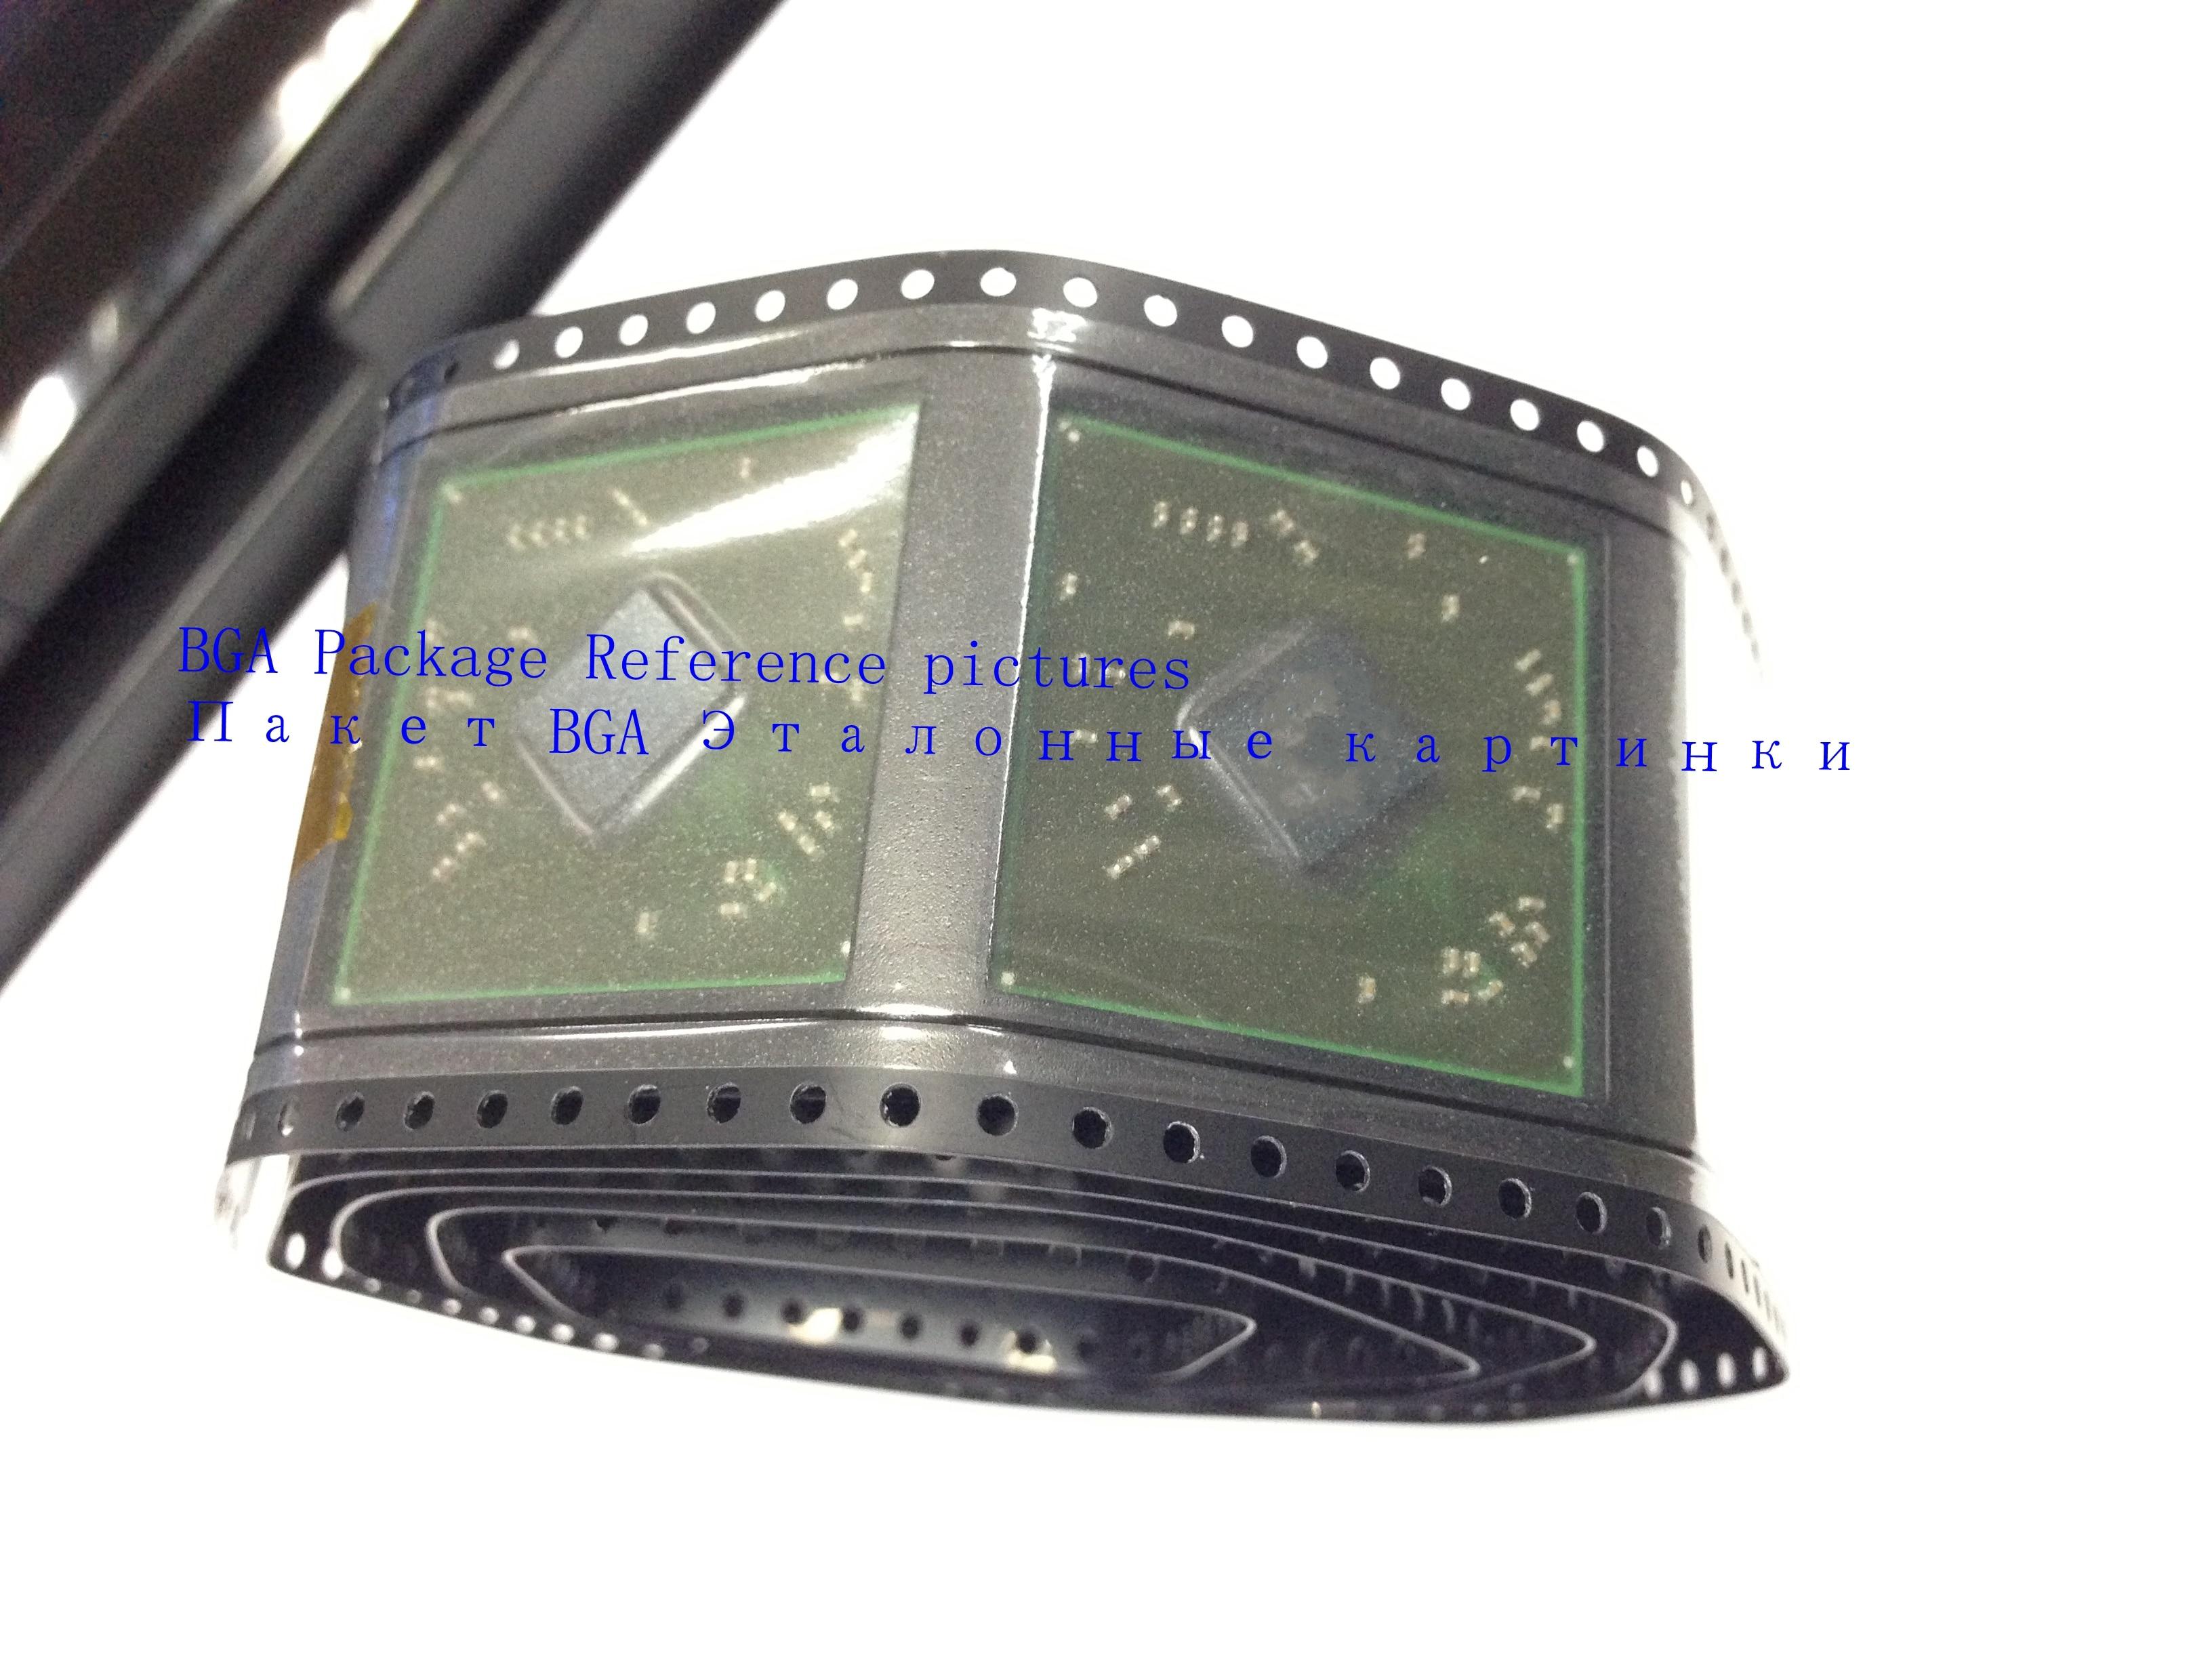 1pcs/lot 100% New Z3735D SR1U7 BGA chip DC:201402+lead-free1pcs/lot 100% New Z3735D SR1U7 BGA chip DC:201402+lead-free